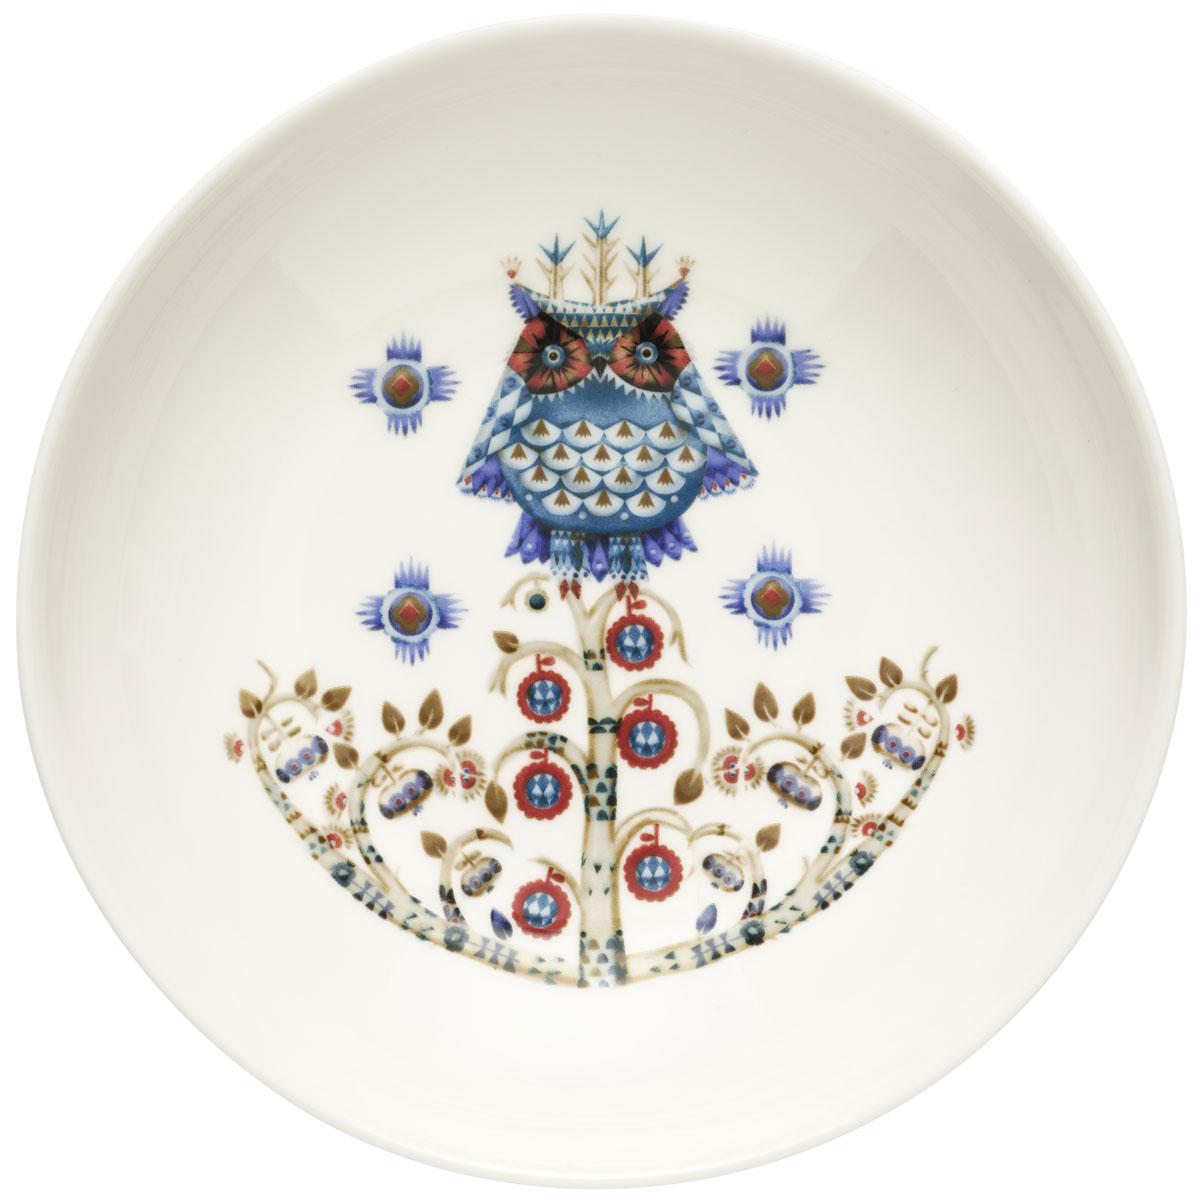 Тарелка глубокая Iittala Taika, цвет: белый, диаметр 20 см1011649